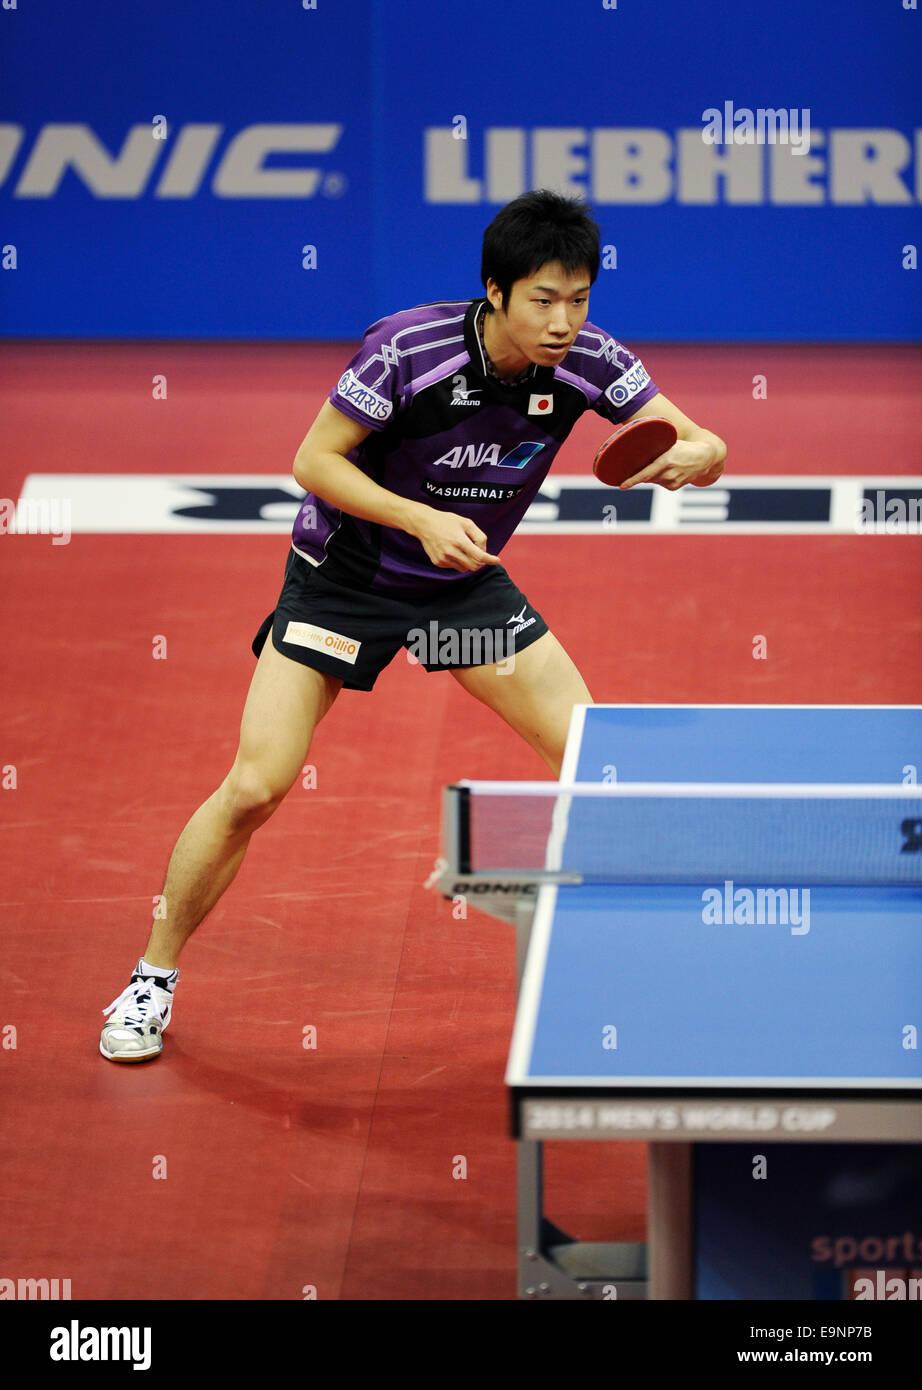 ISS Arena Duesseldorf, Alemania 16.10.2014, Liebherr Tabletennis World Cup , Jun Mizutani (JPN) Imagen De Stock